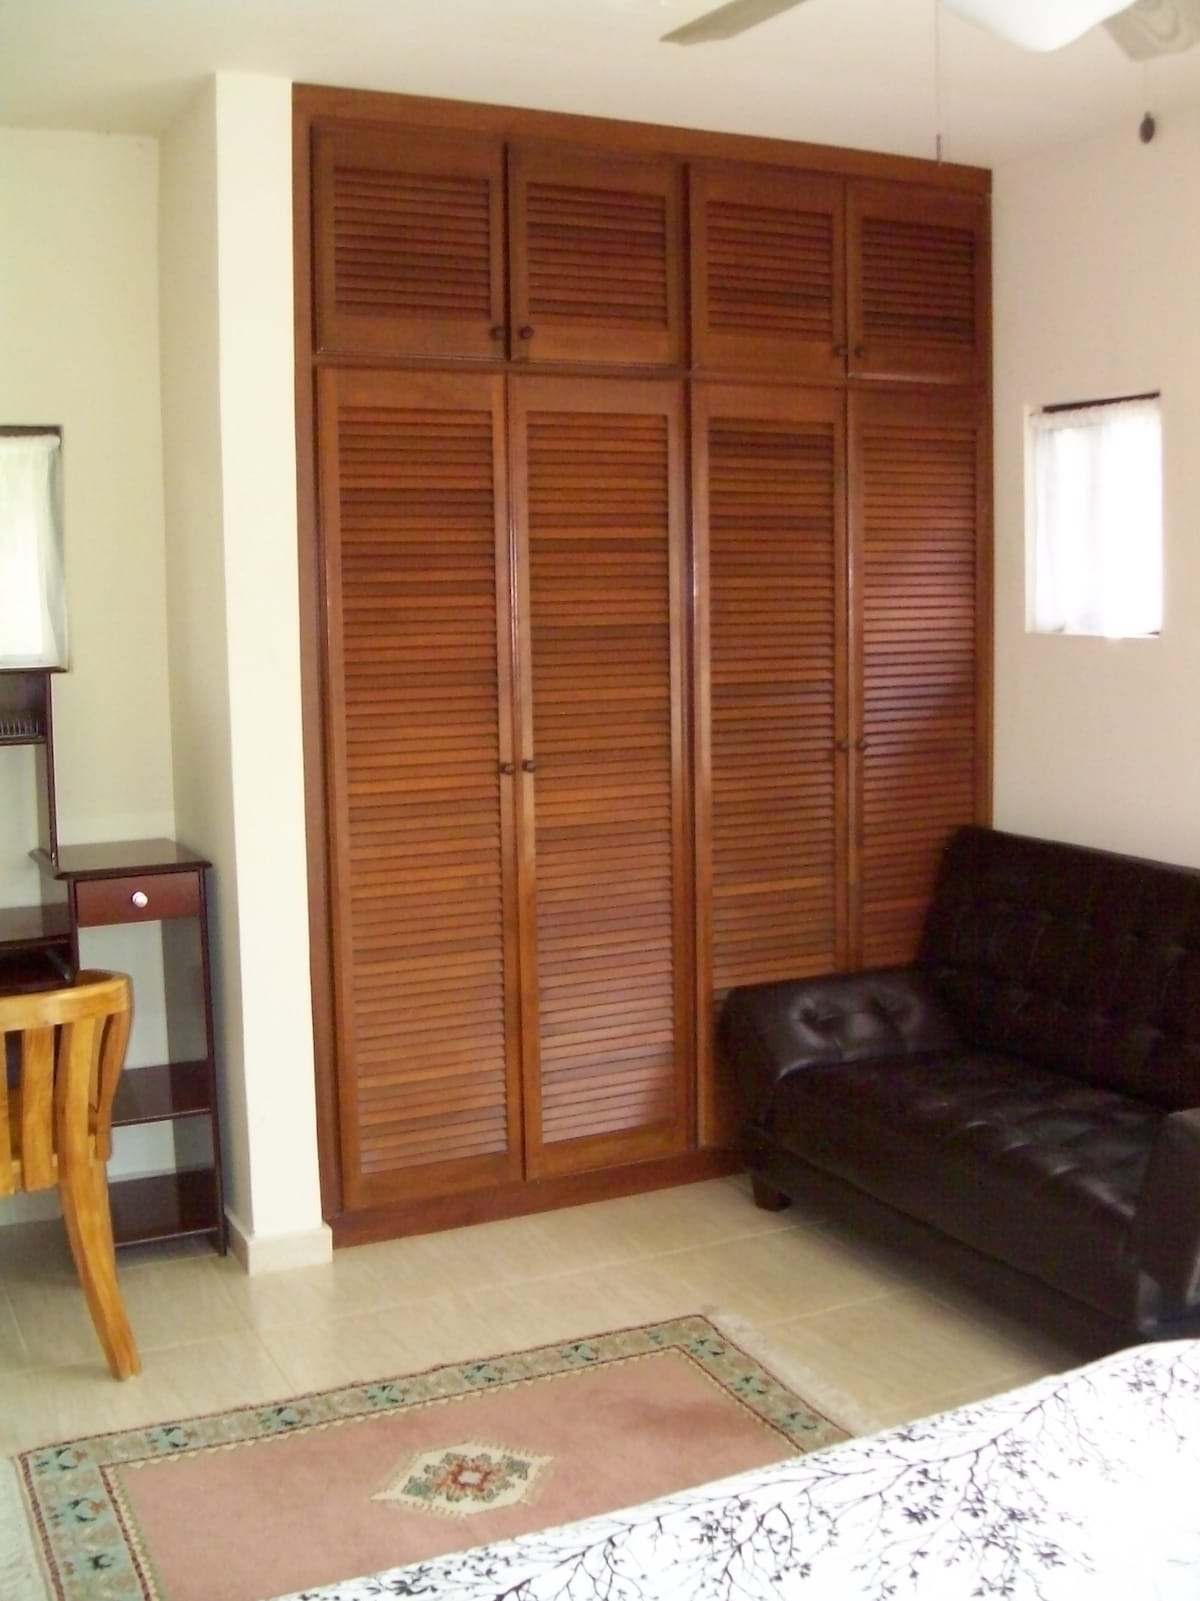 Hardwood louvered doors (closet area) and sitting area